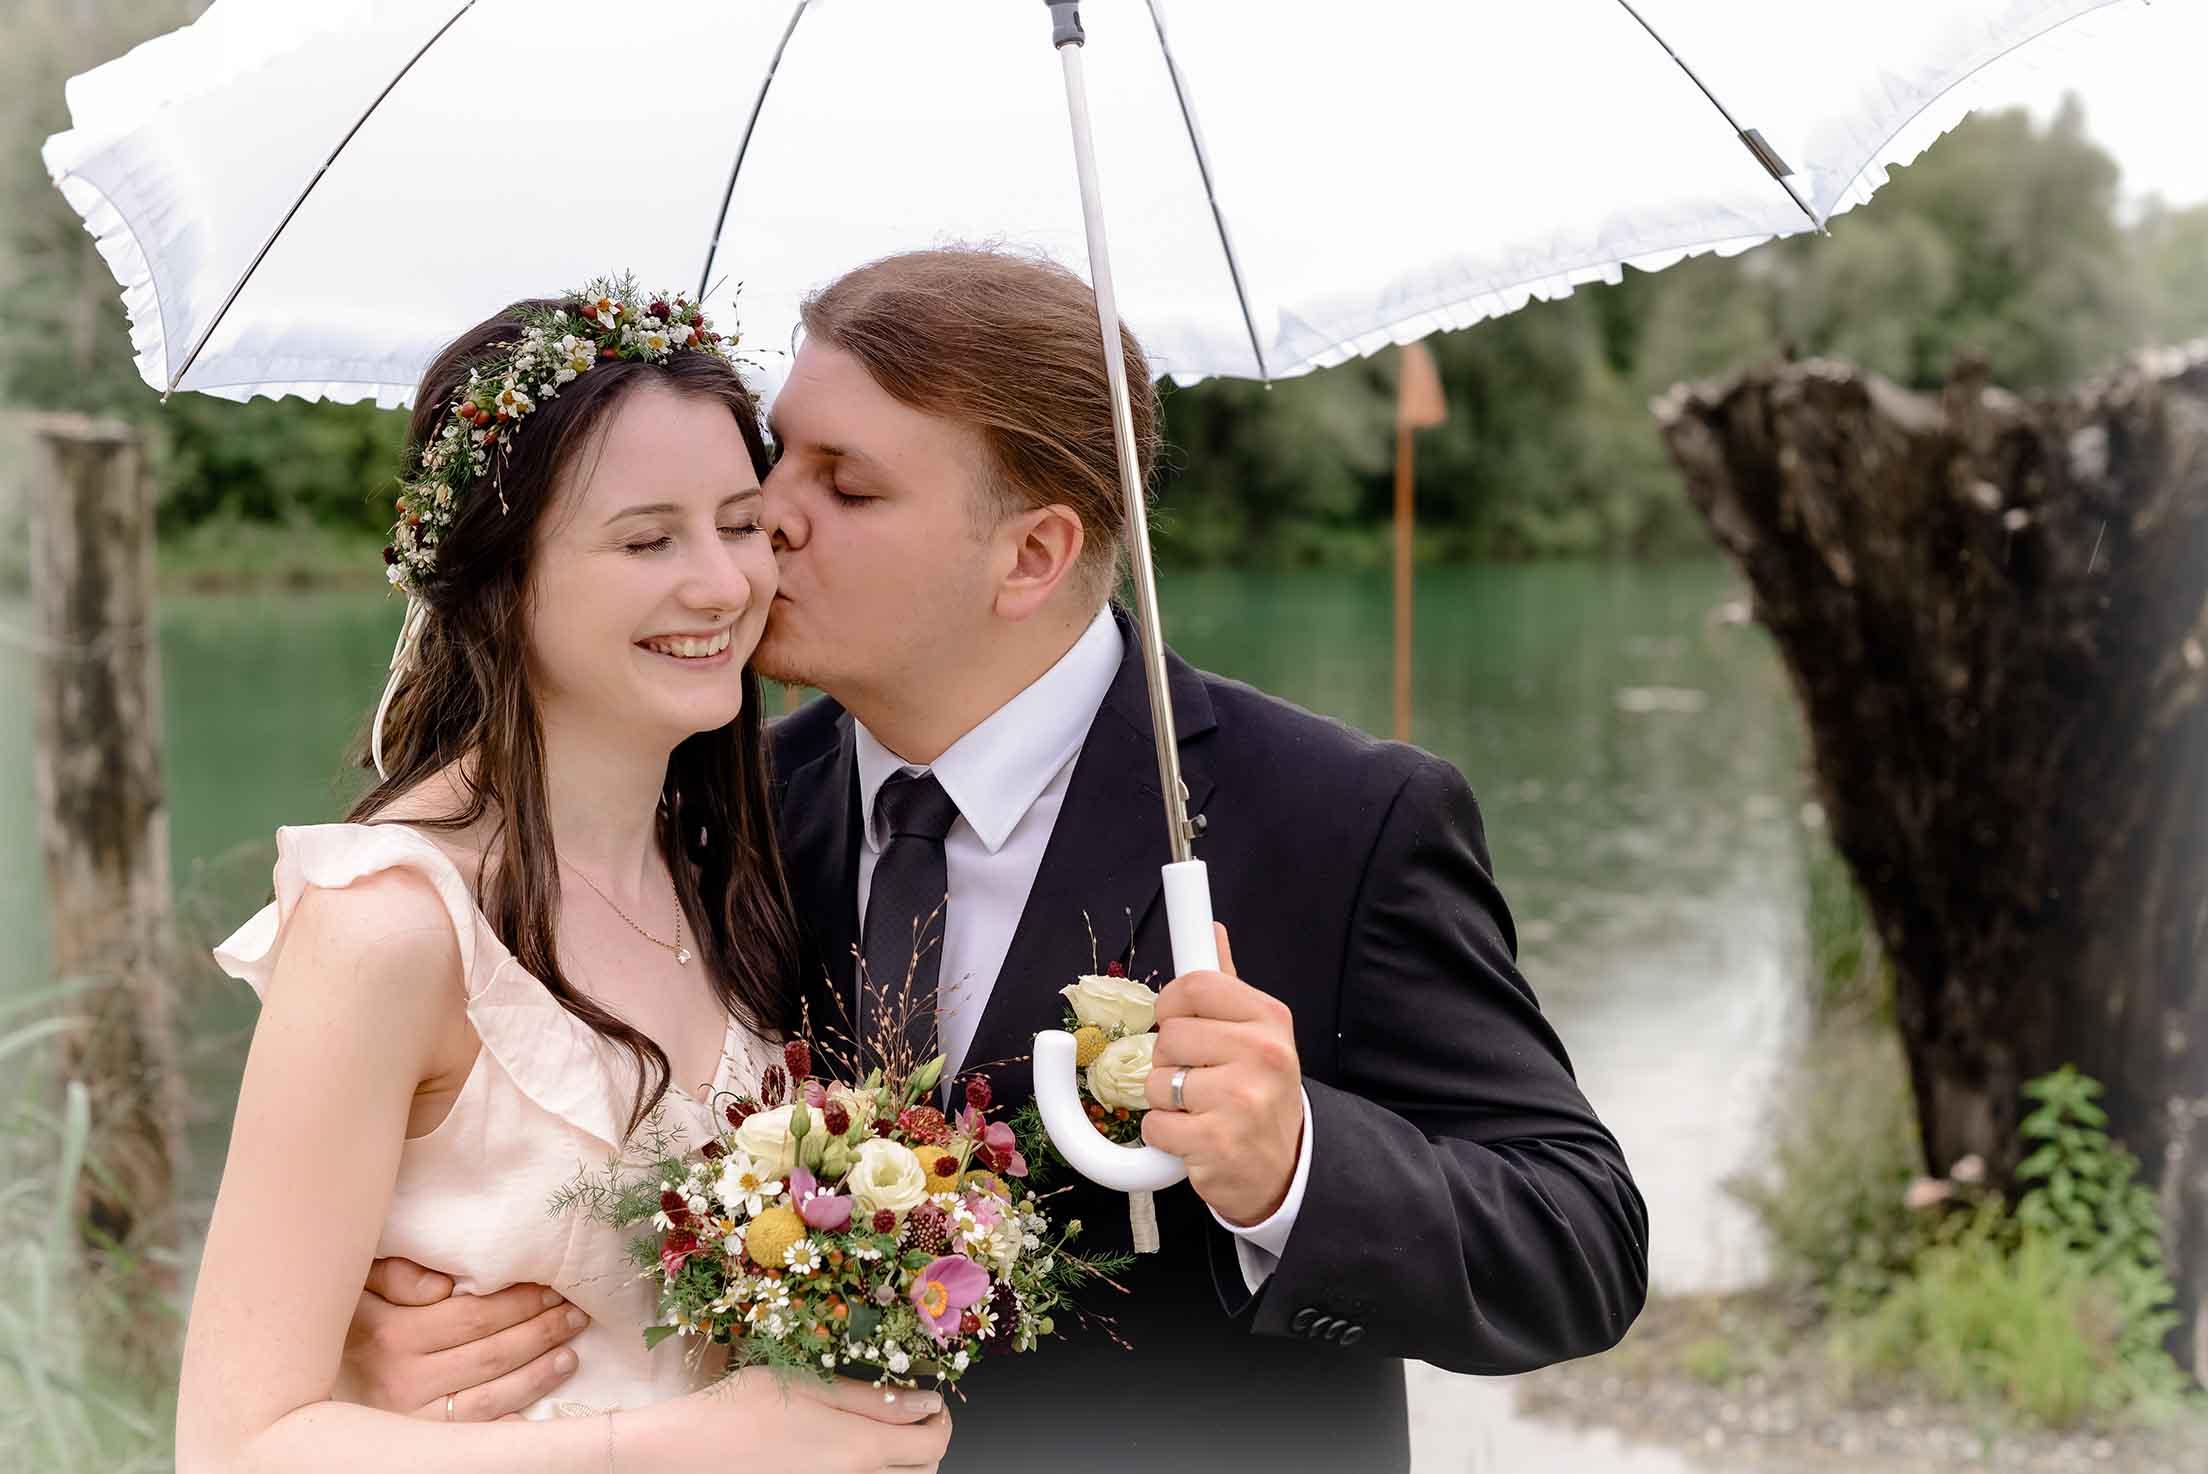 Hochzeitsfotografin Claudia Kadur